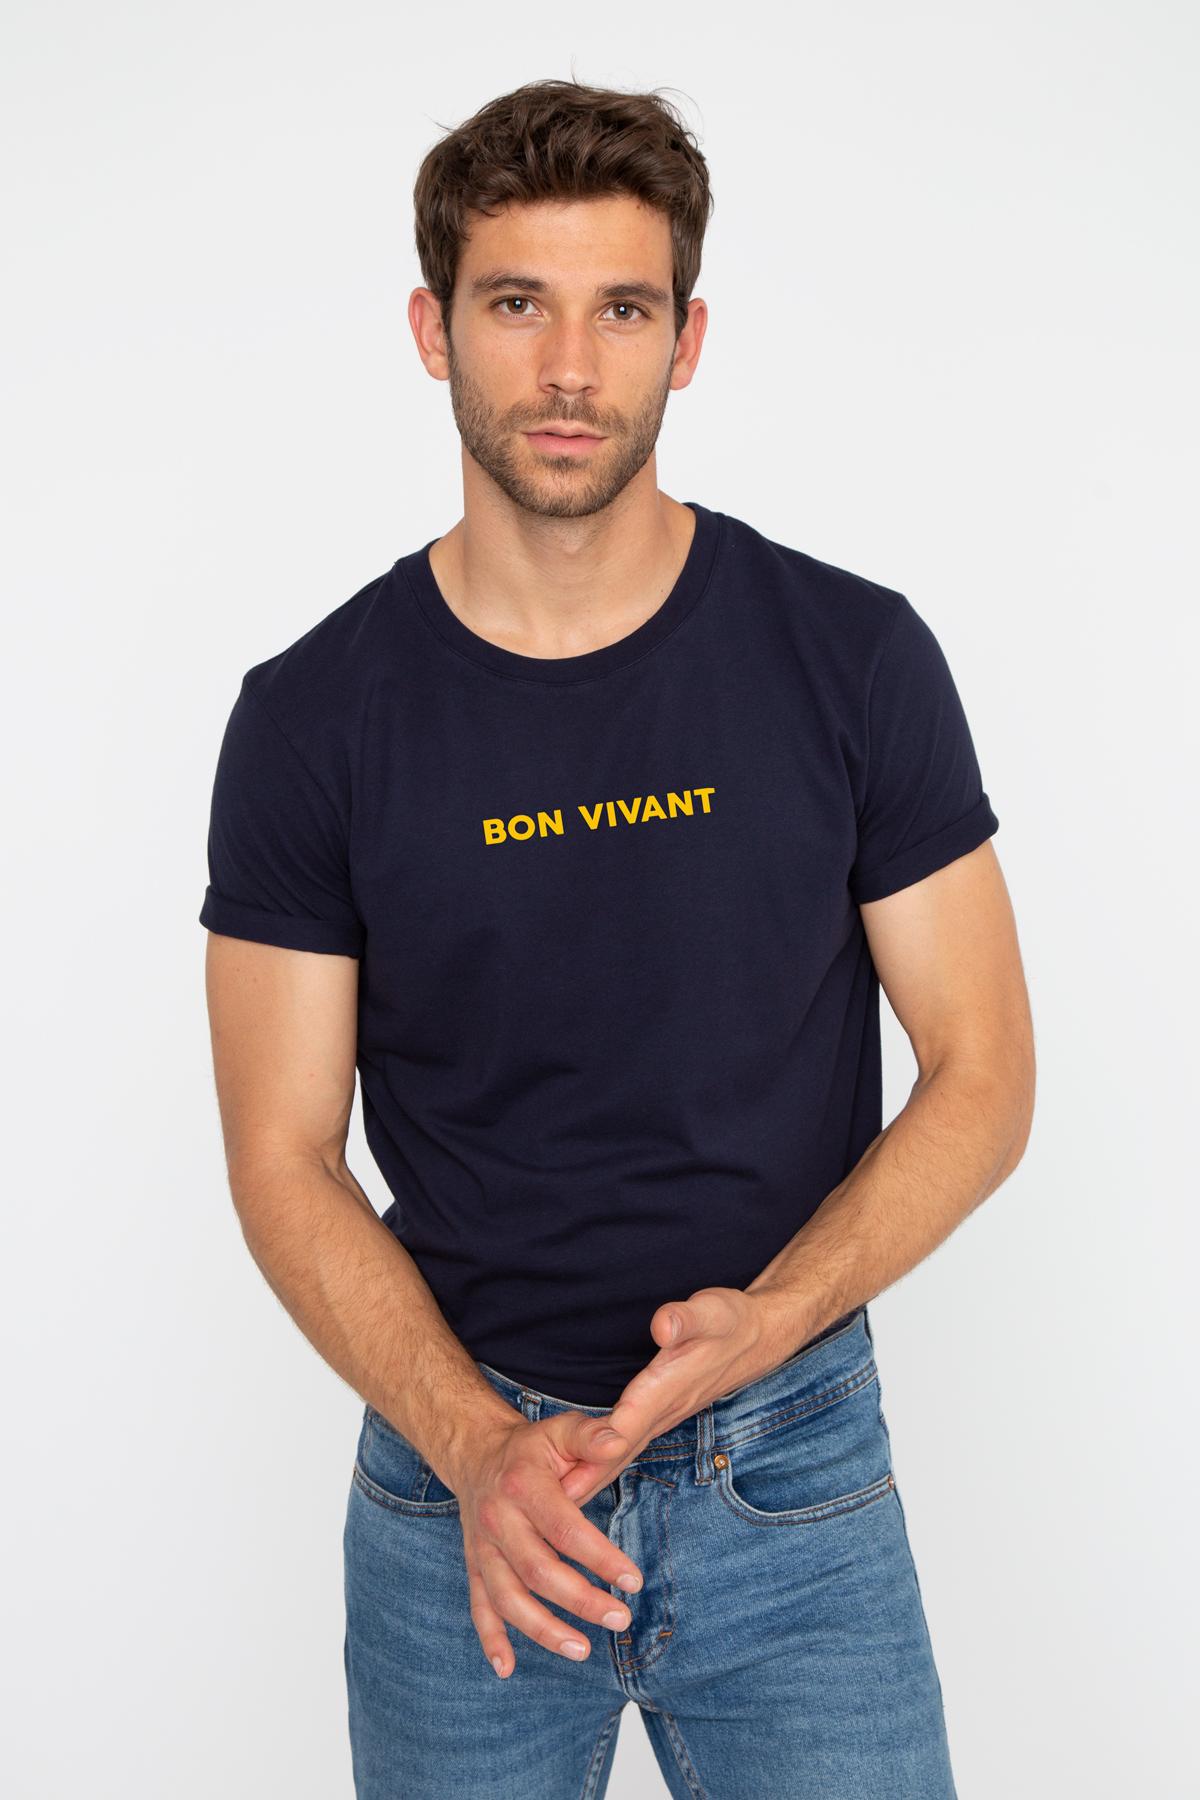 Tshirt BON VIVANT